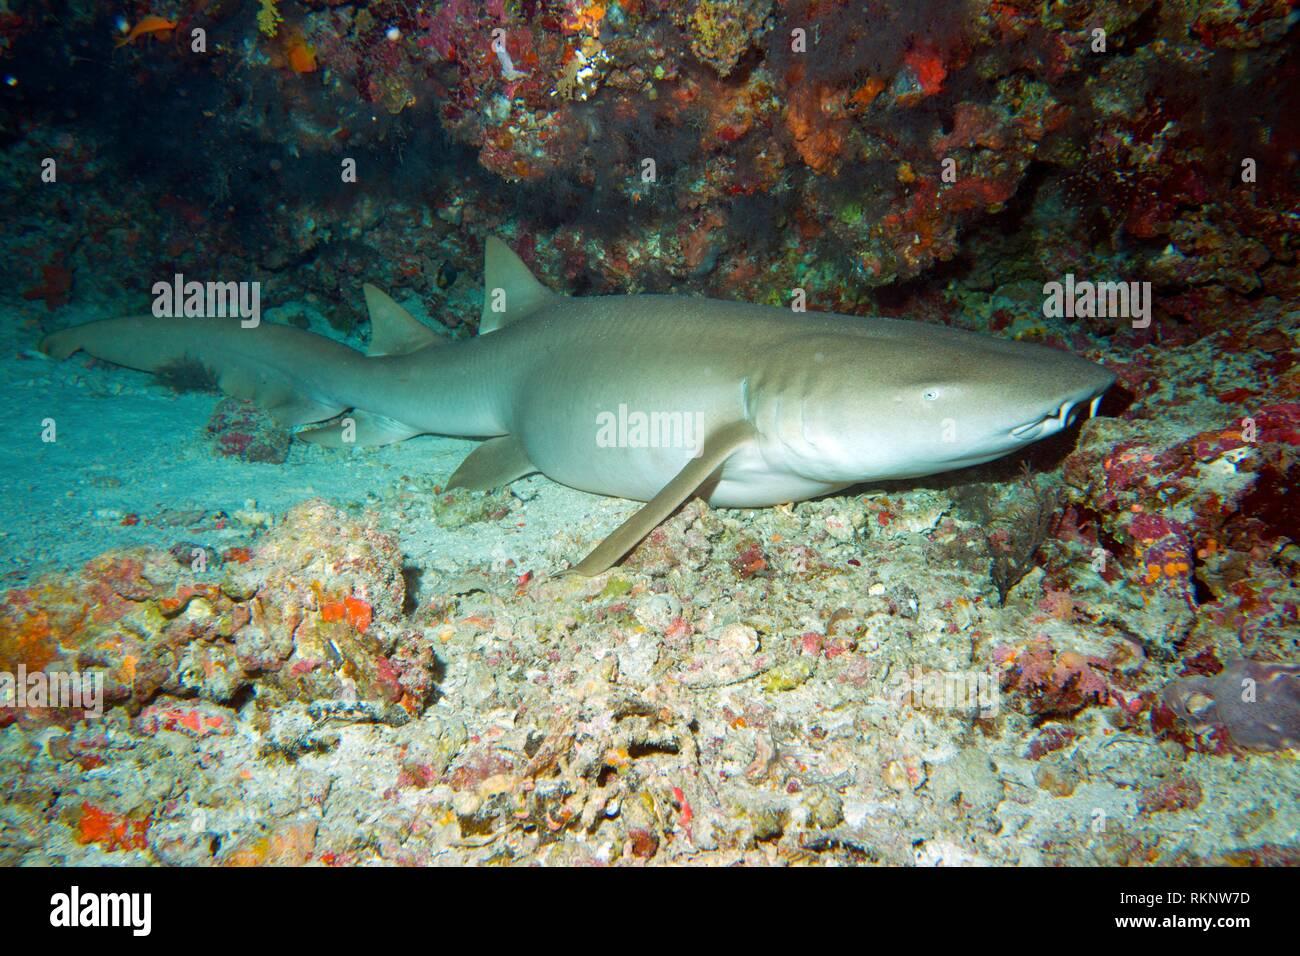 Tiger Shark, Indian Ocean, Maledives, South Asia. - Stock Image